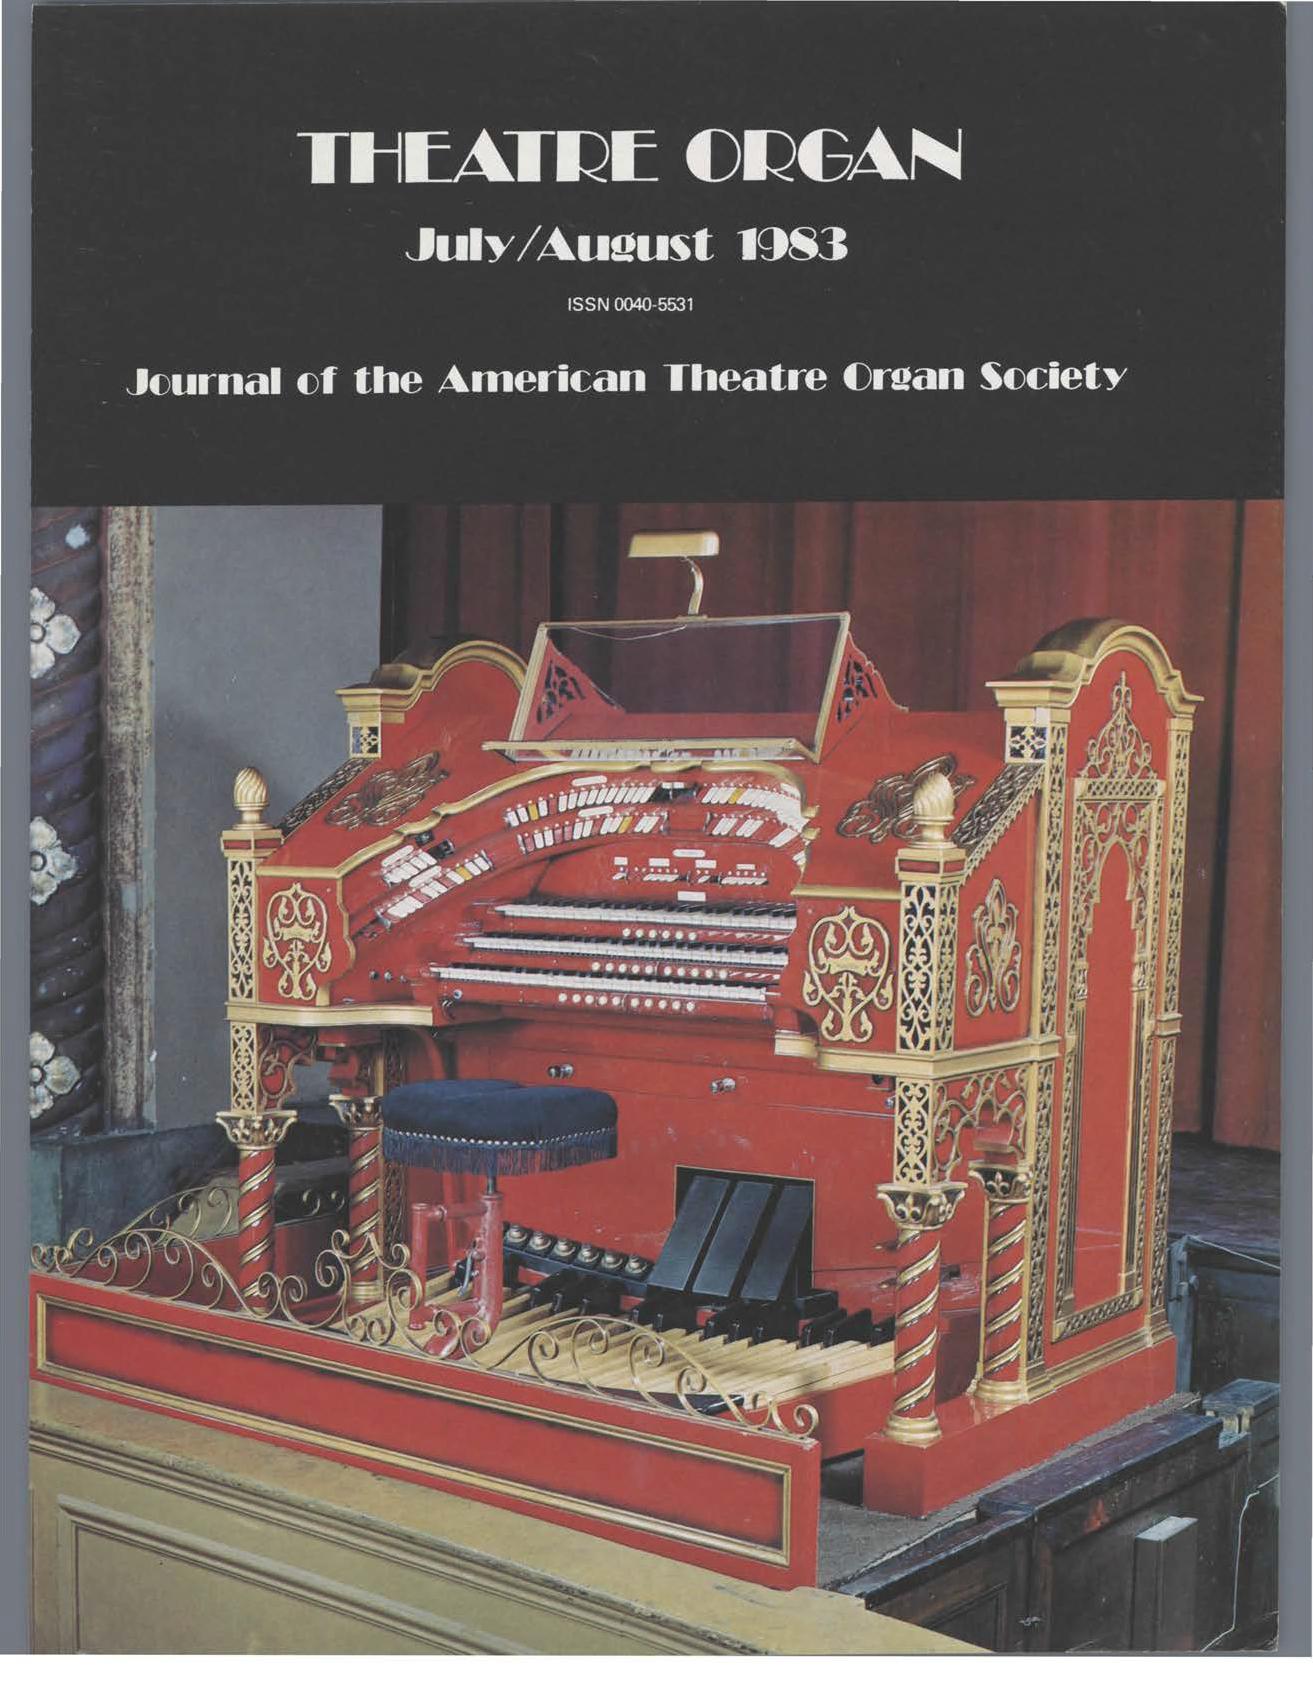 Theatre Organ, July - August 1983, Volume 25, Number 4